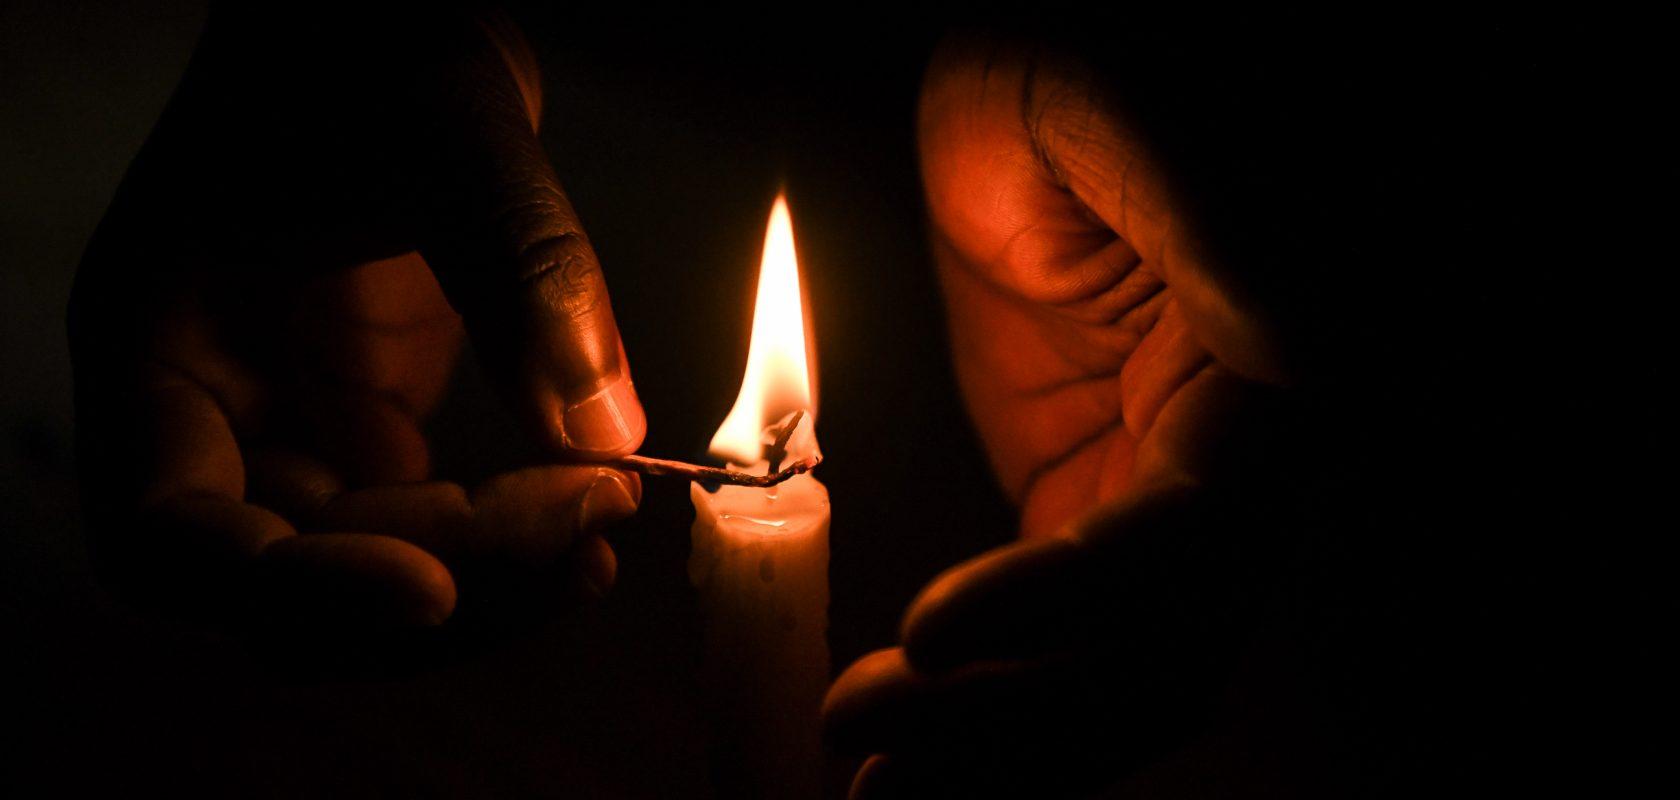 Candle flame in TA Kasakula's hands